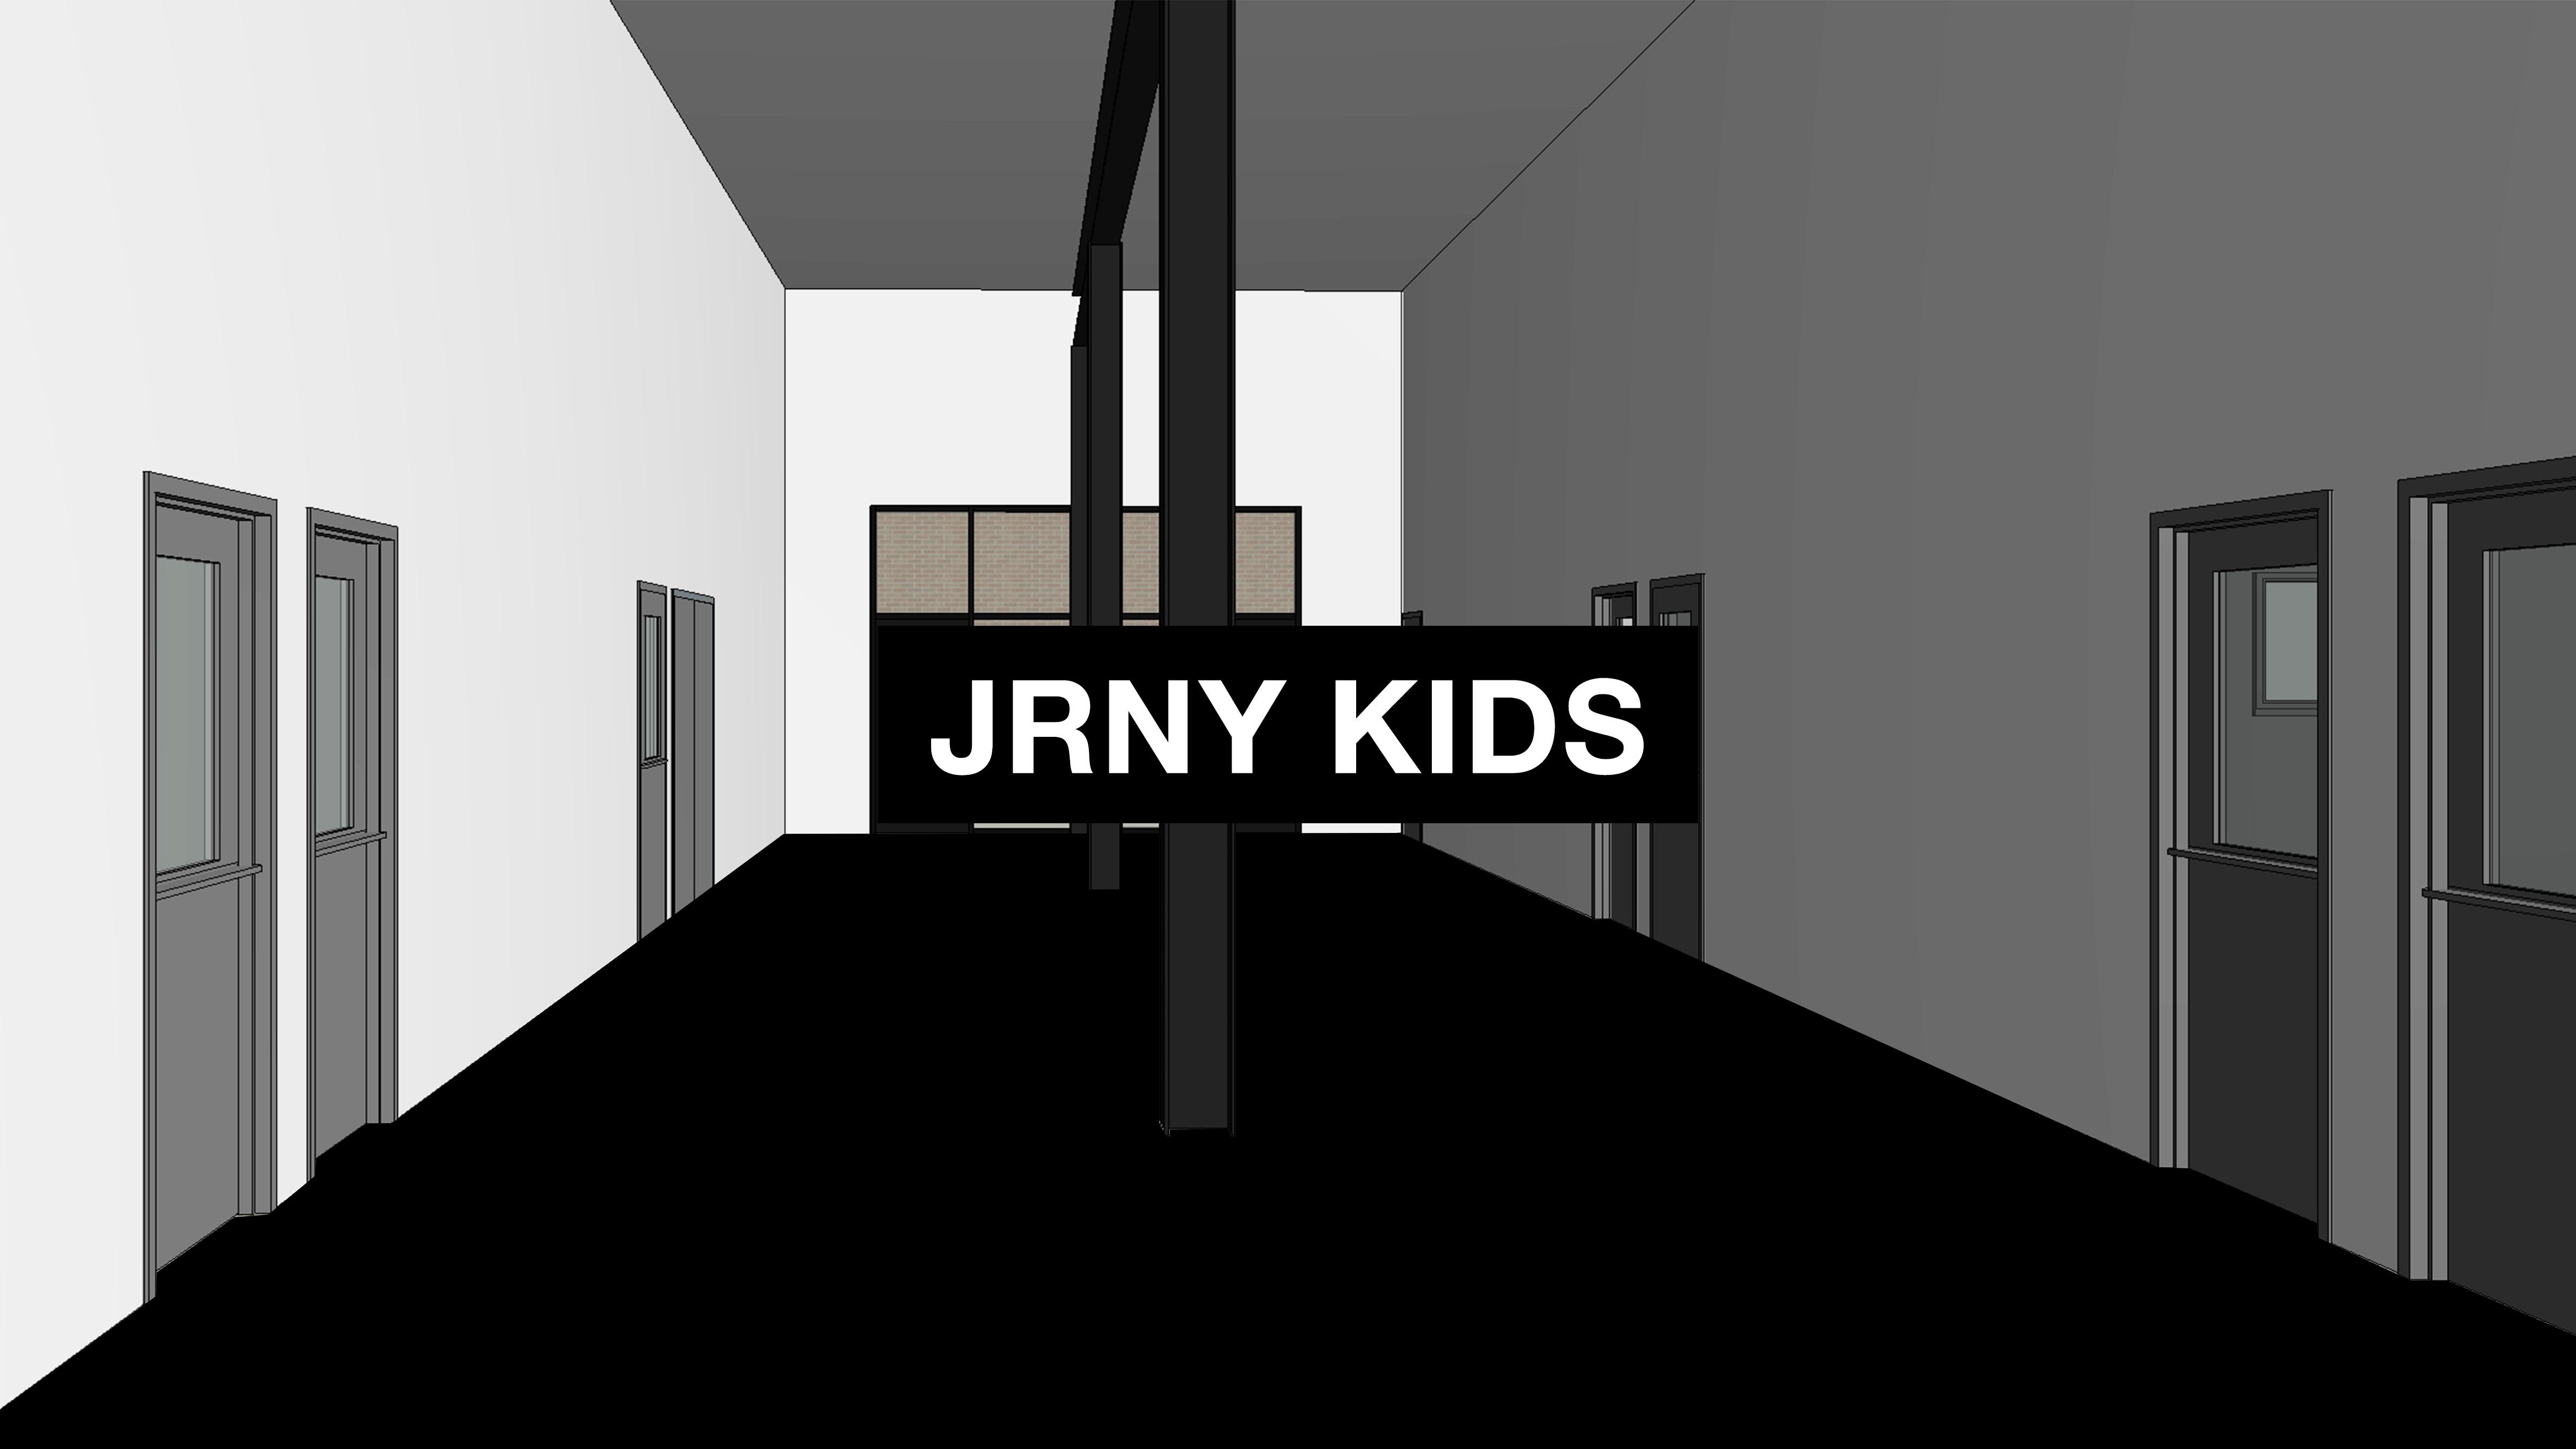 JRNY KIDS